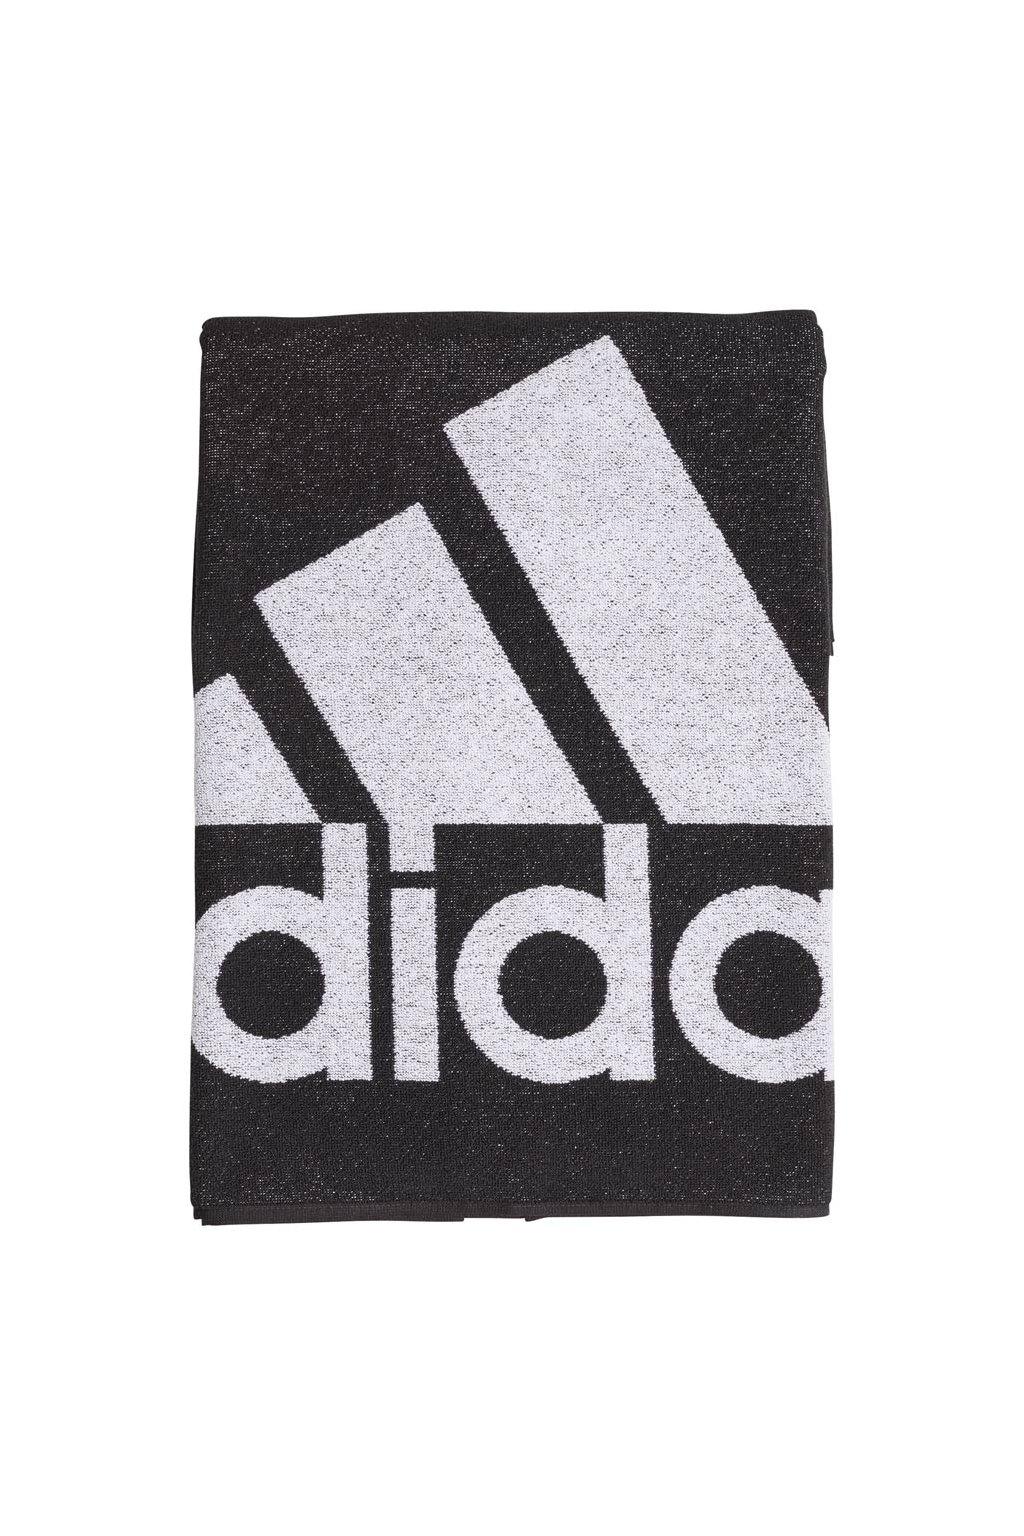 Uterák Adidas Towel L čierny DH2866